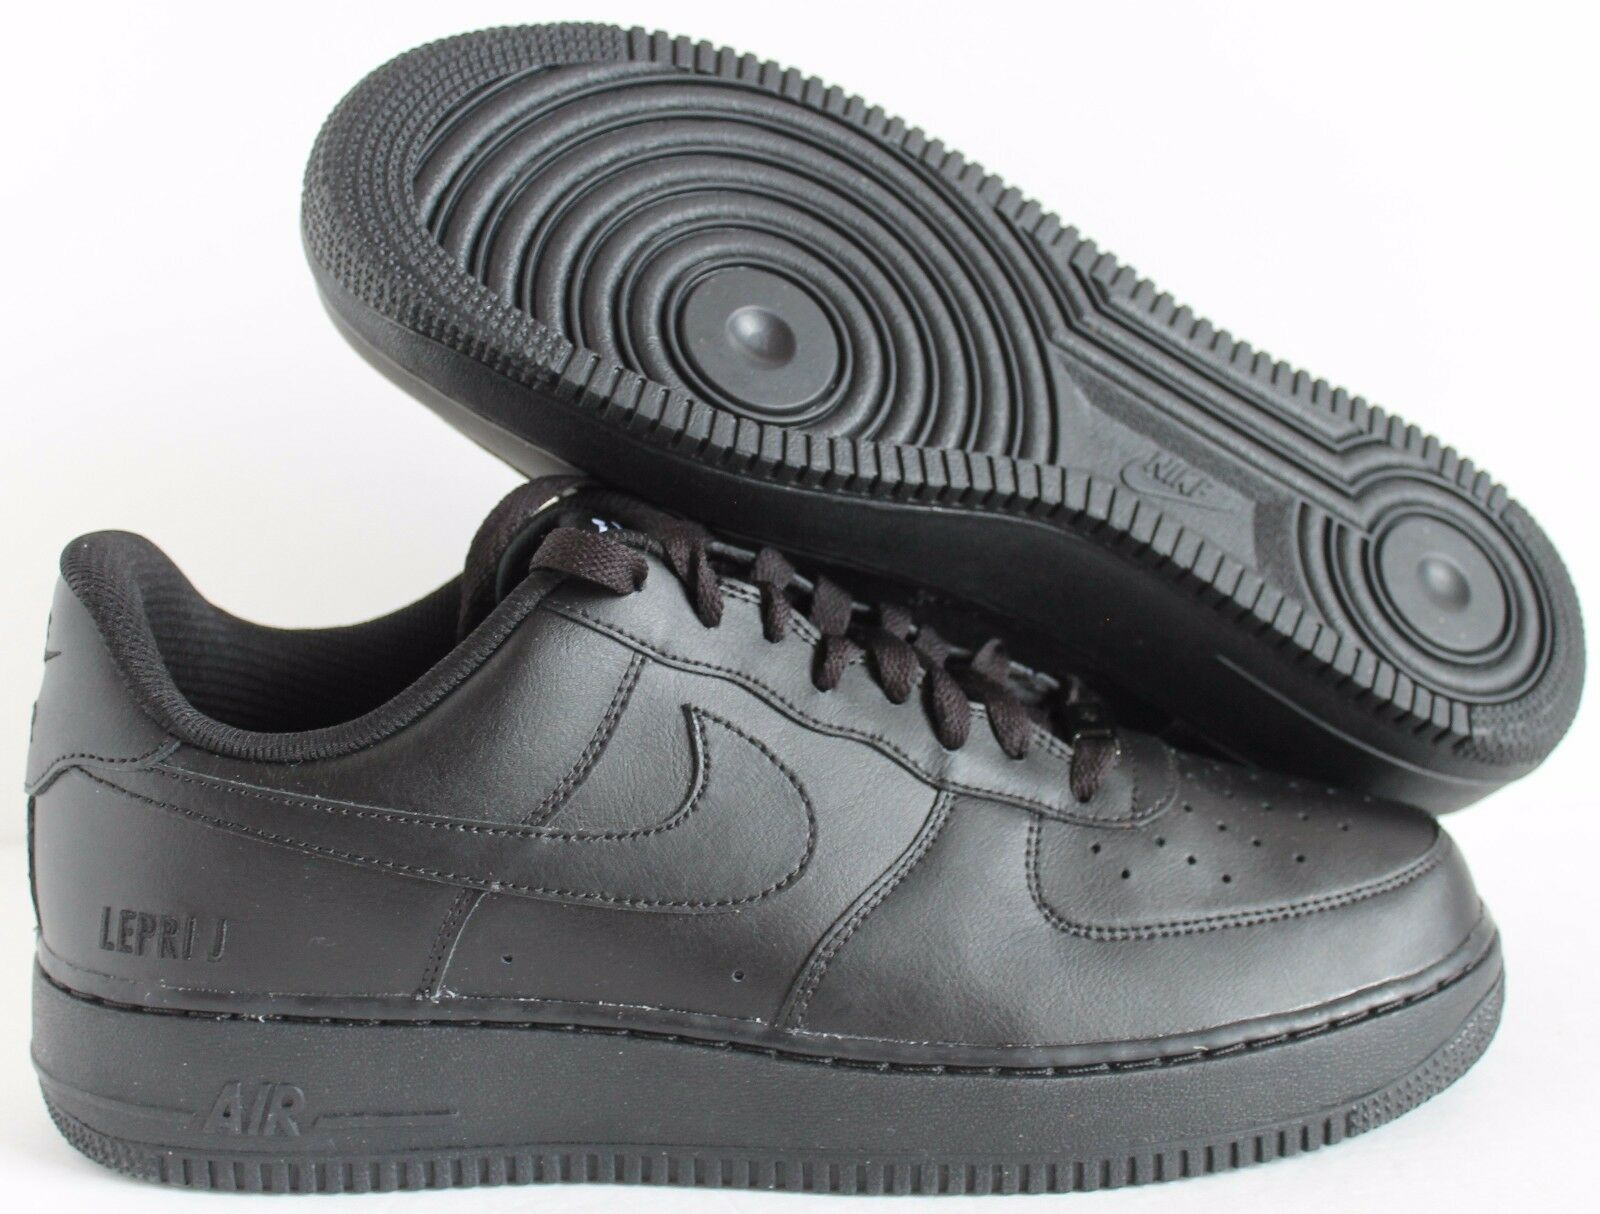 Nike Air Force 1 Low ID Black Duckboot SZ 12  [808791-993]